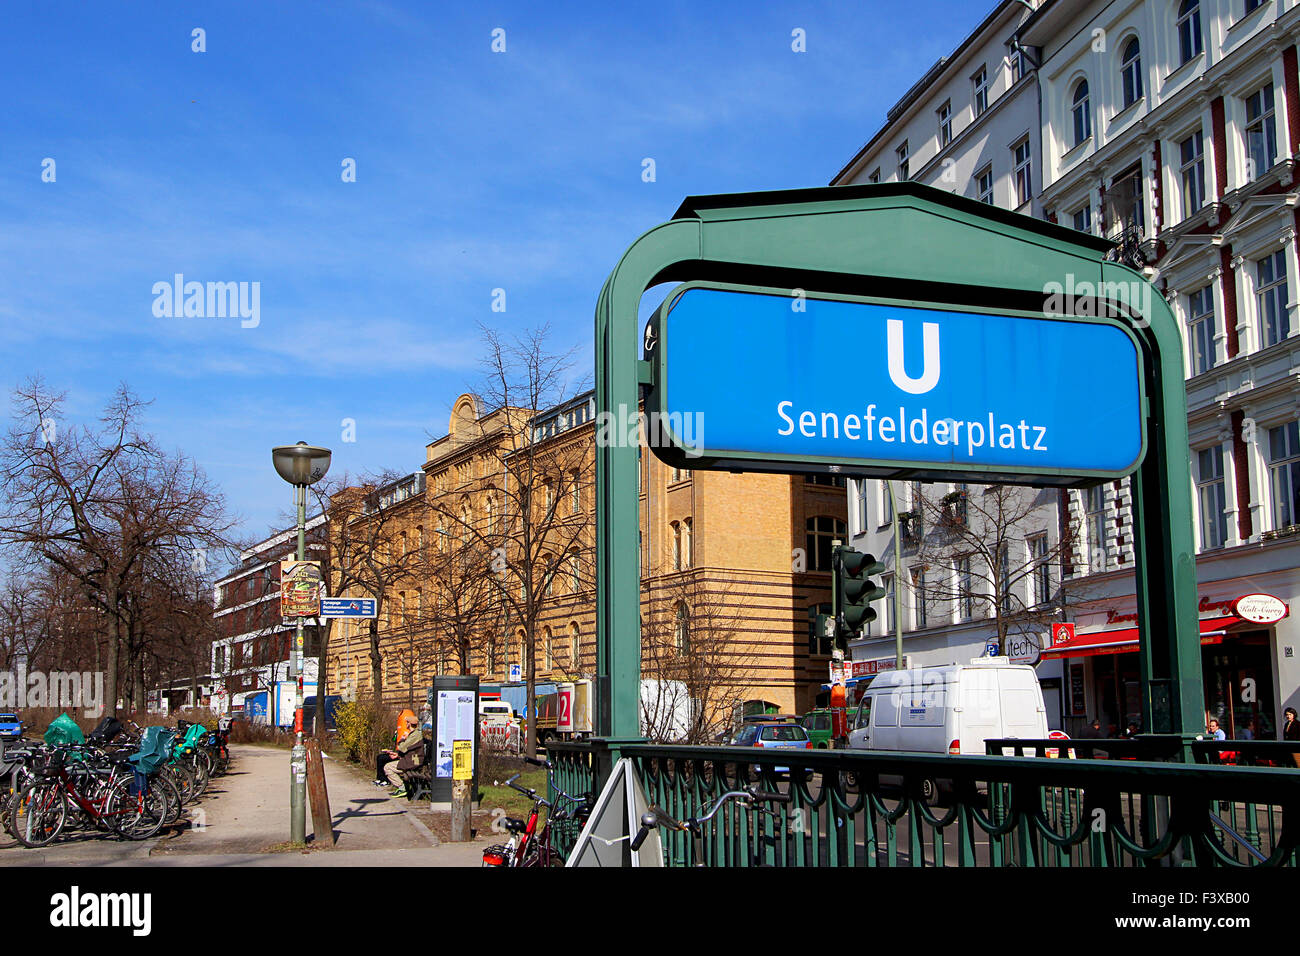 undergound station in berlin - Stock Image